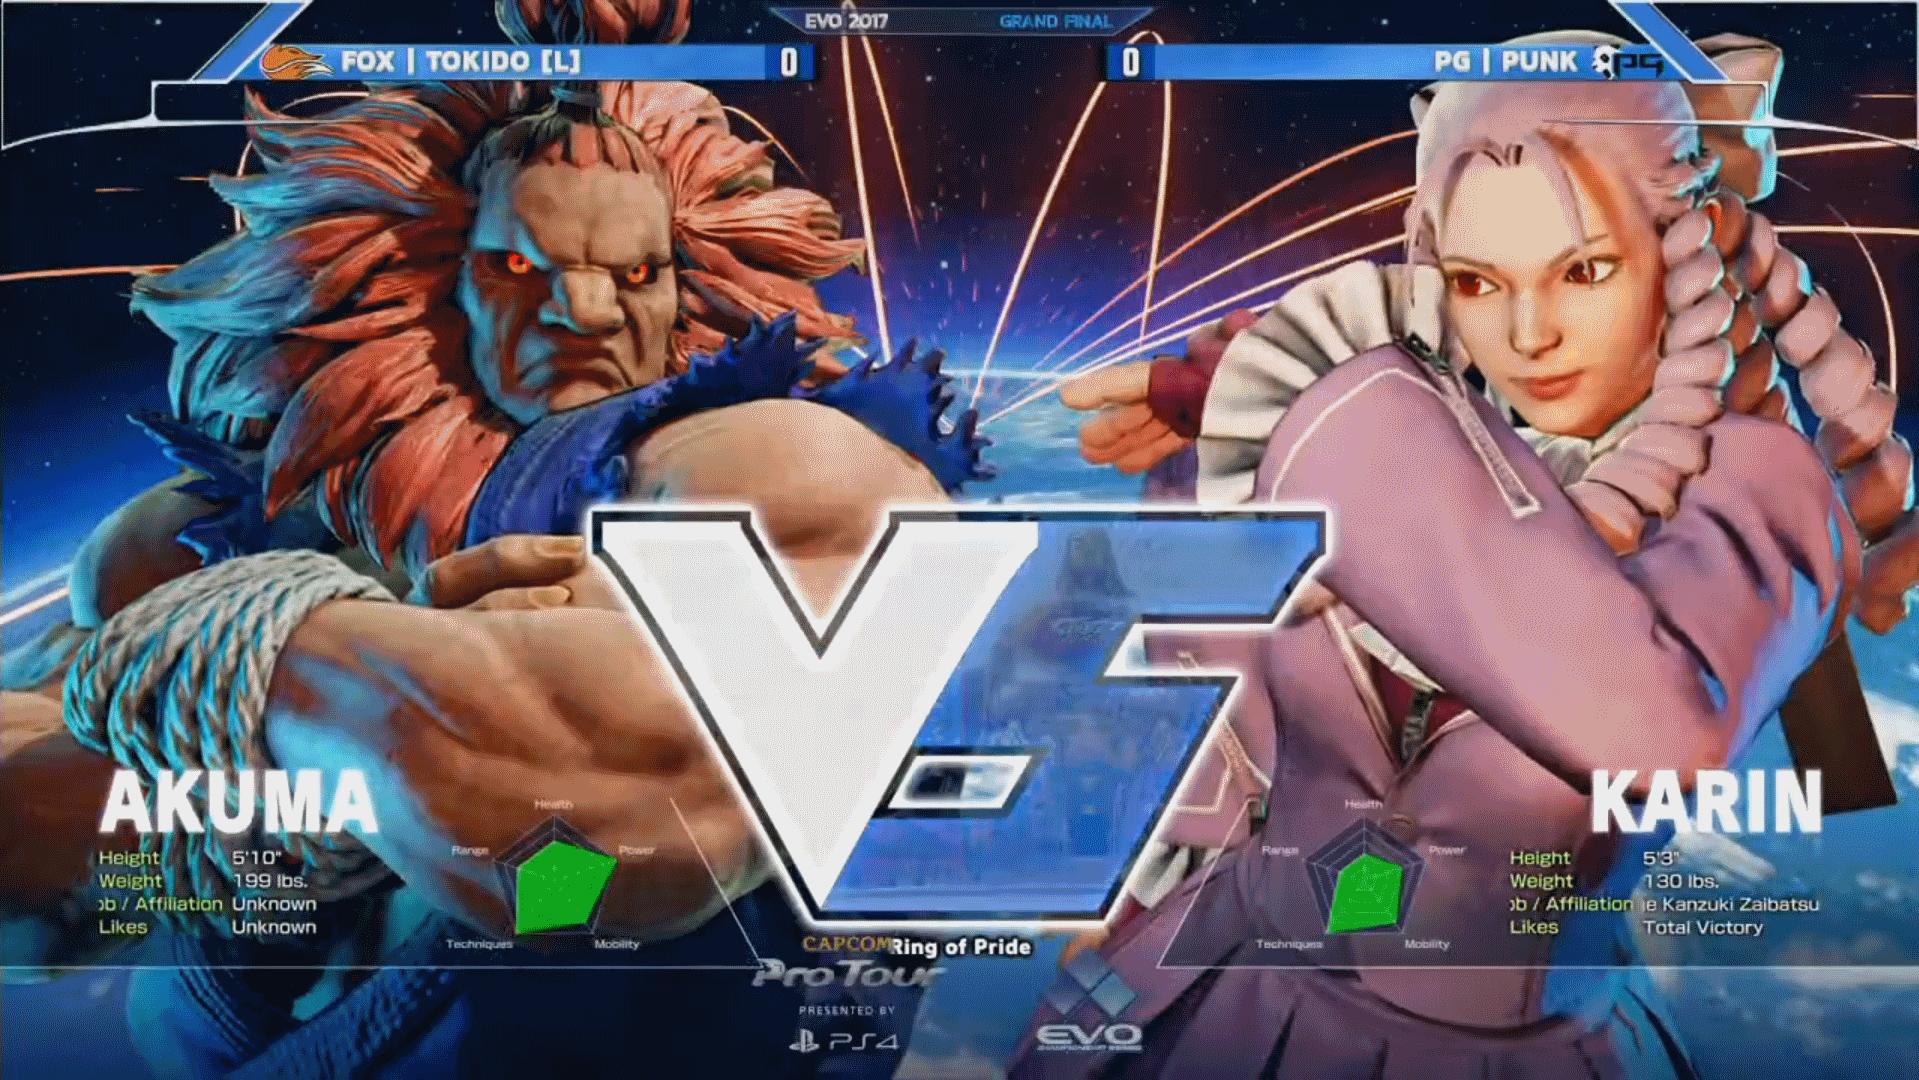 EVO is the biggest fighting game tournament around